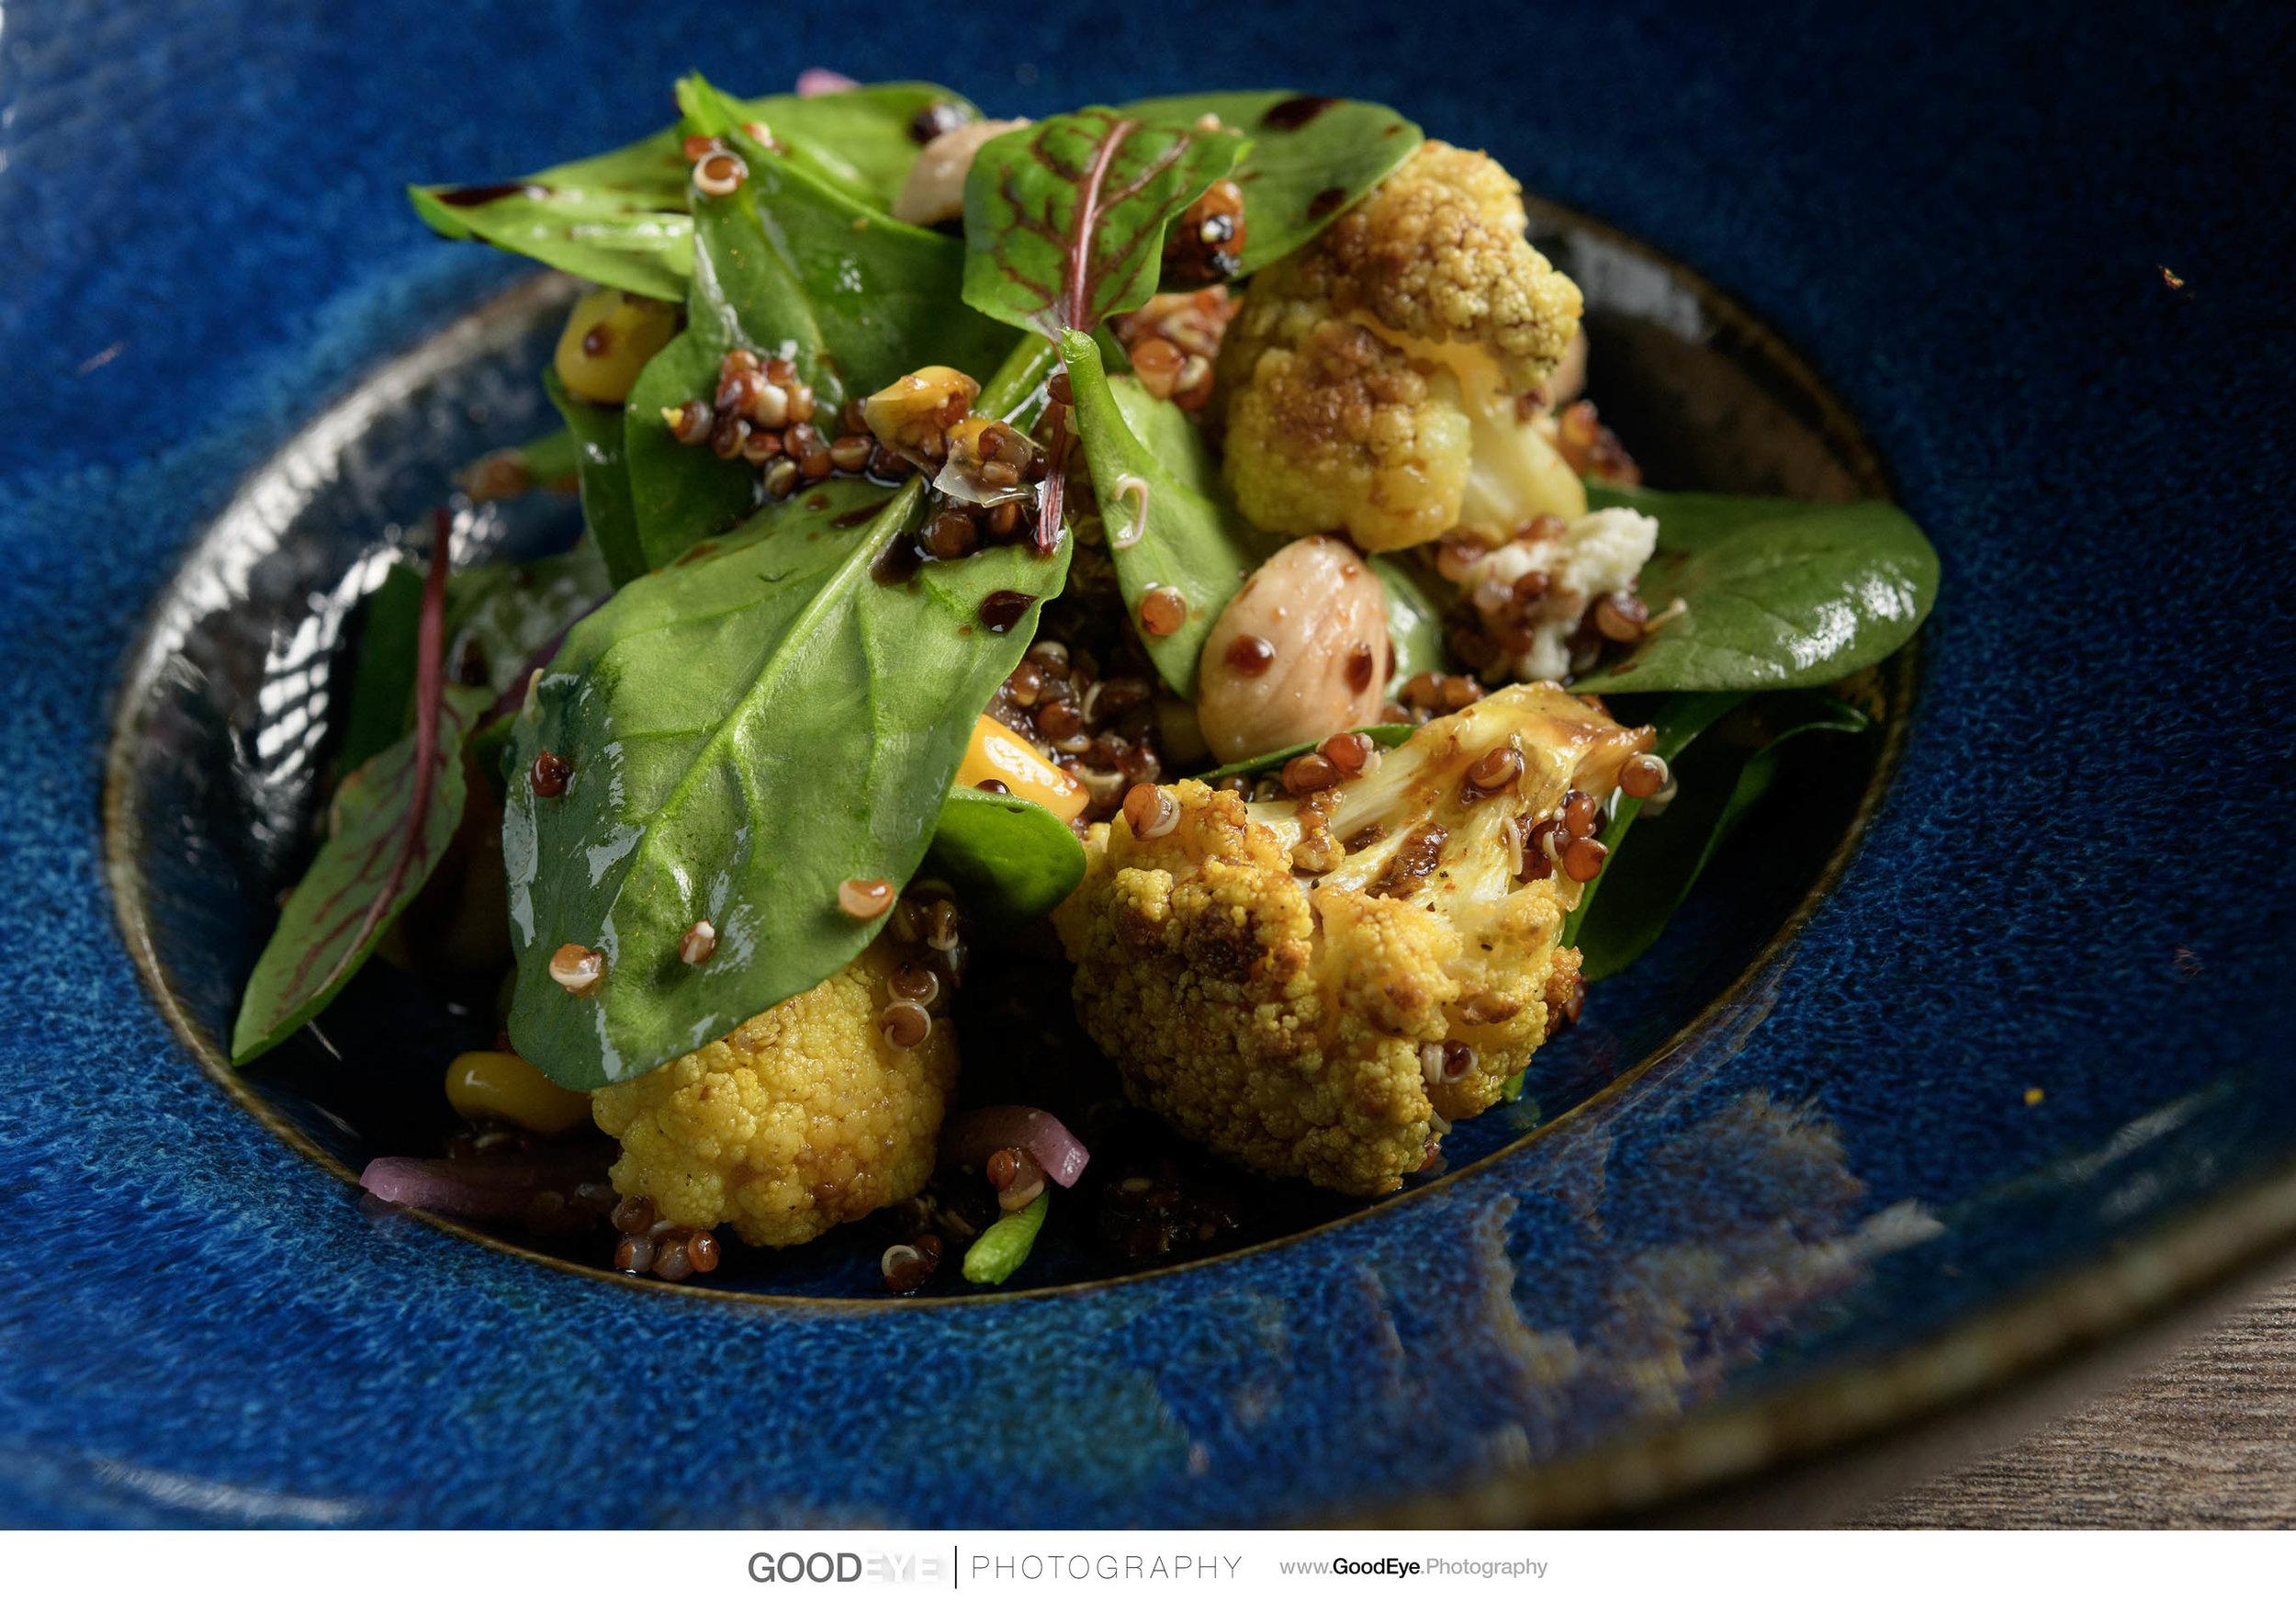 Quattro Four Seasons Palo Alto Food and Portrait Photography - b